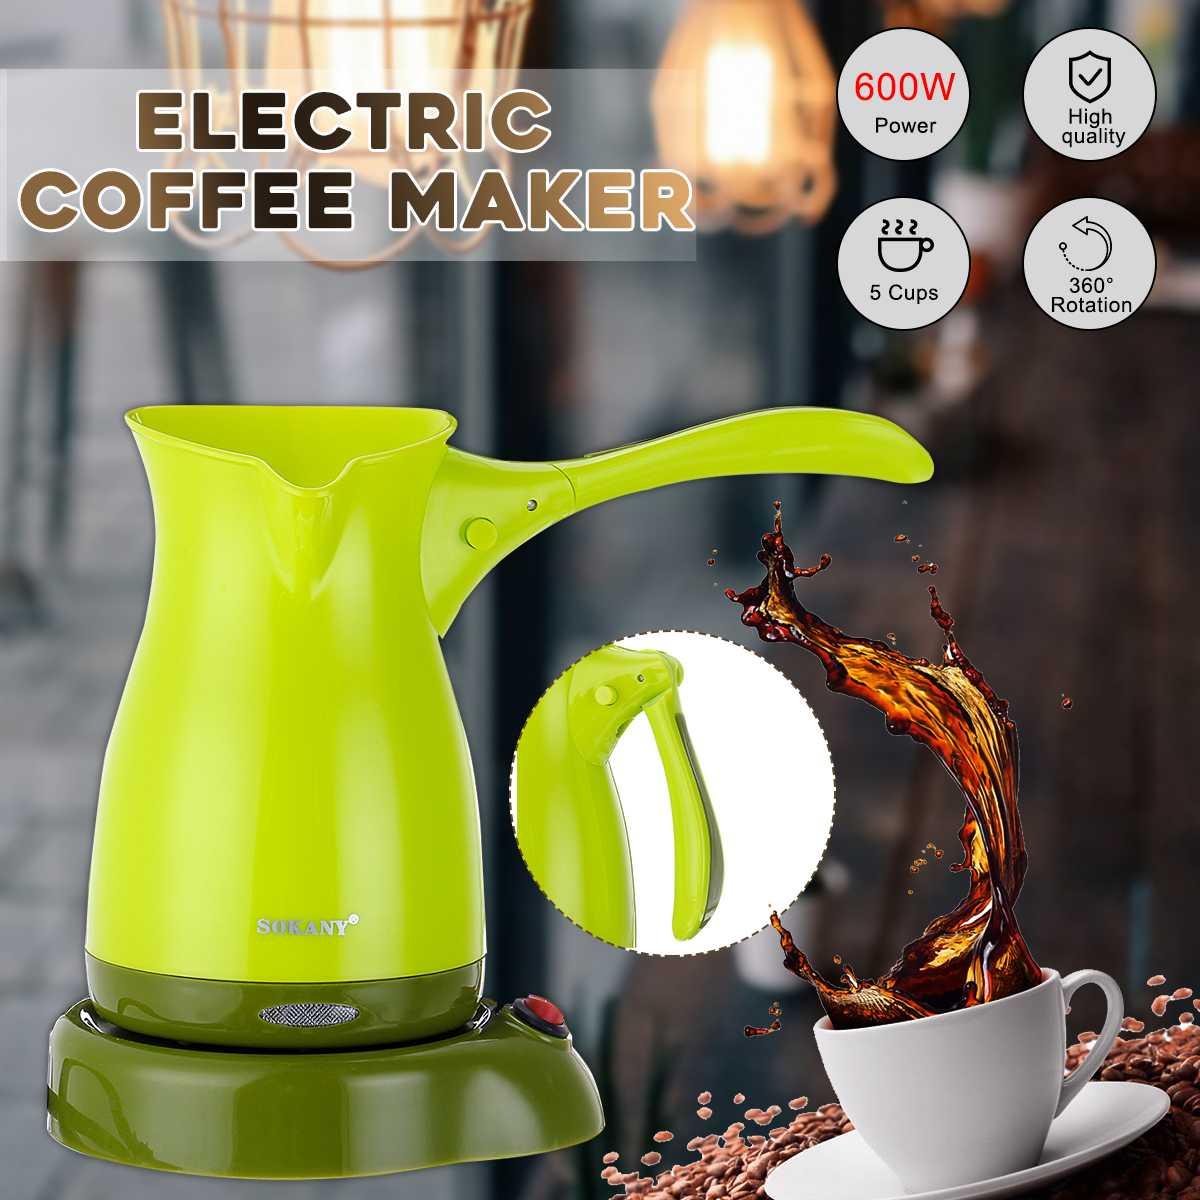 Portable Electric Coffee Maker Espresso Tea Moka Pot 220V Turkish Greek Coffee Machine Anti-slip Base Food Grade ABS Kettle